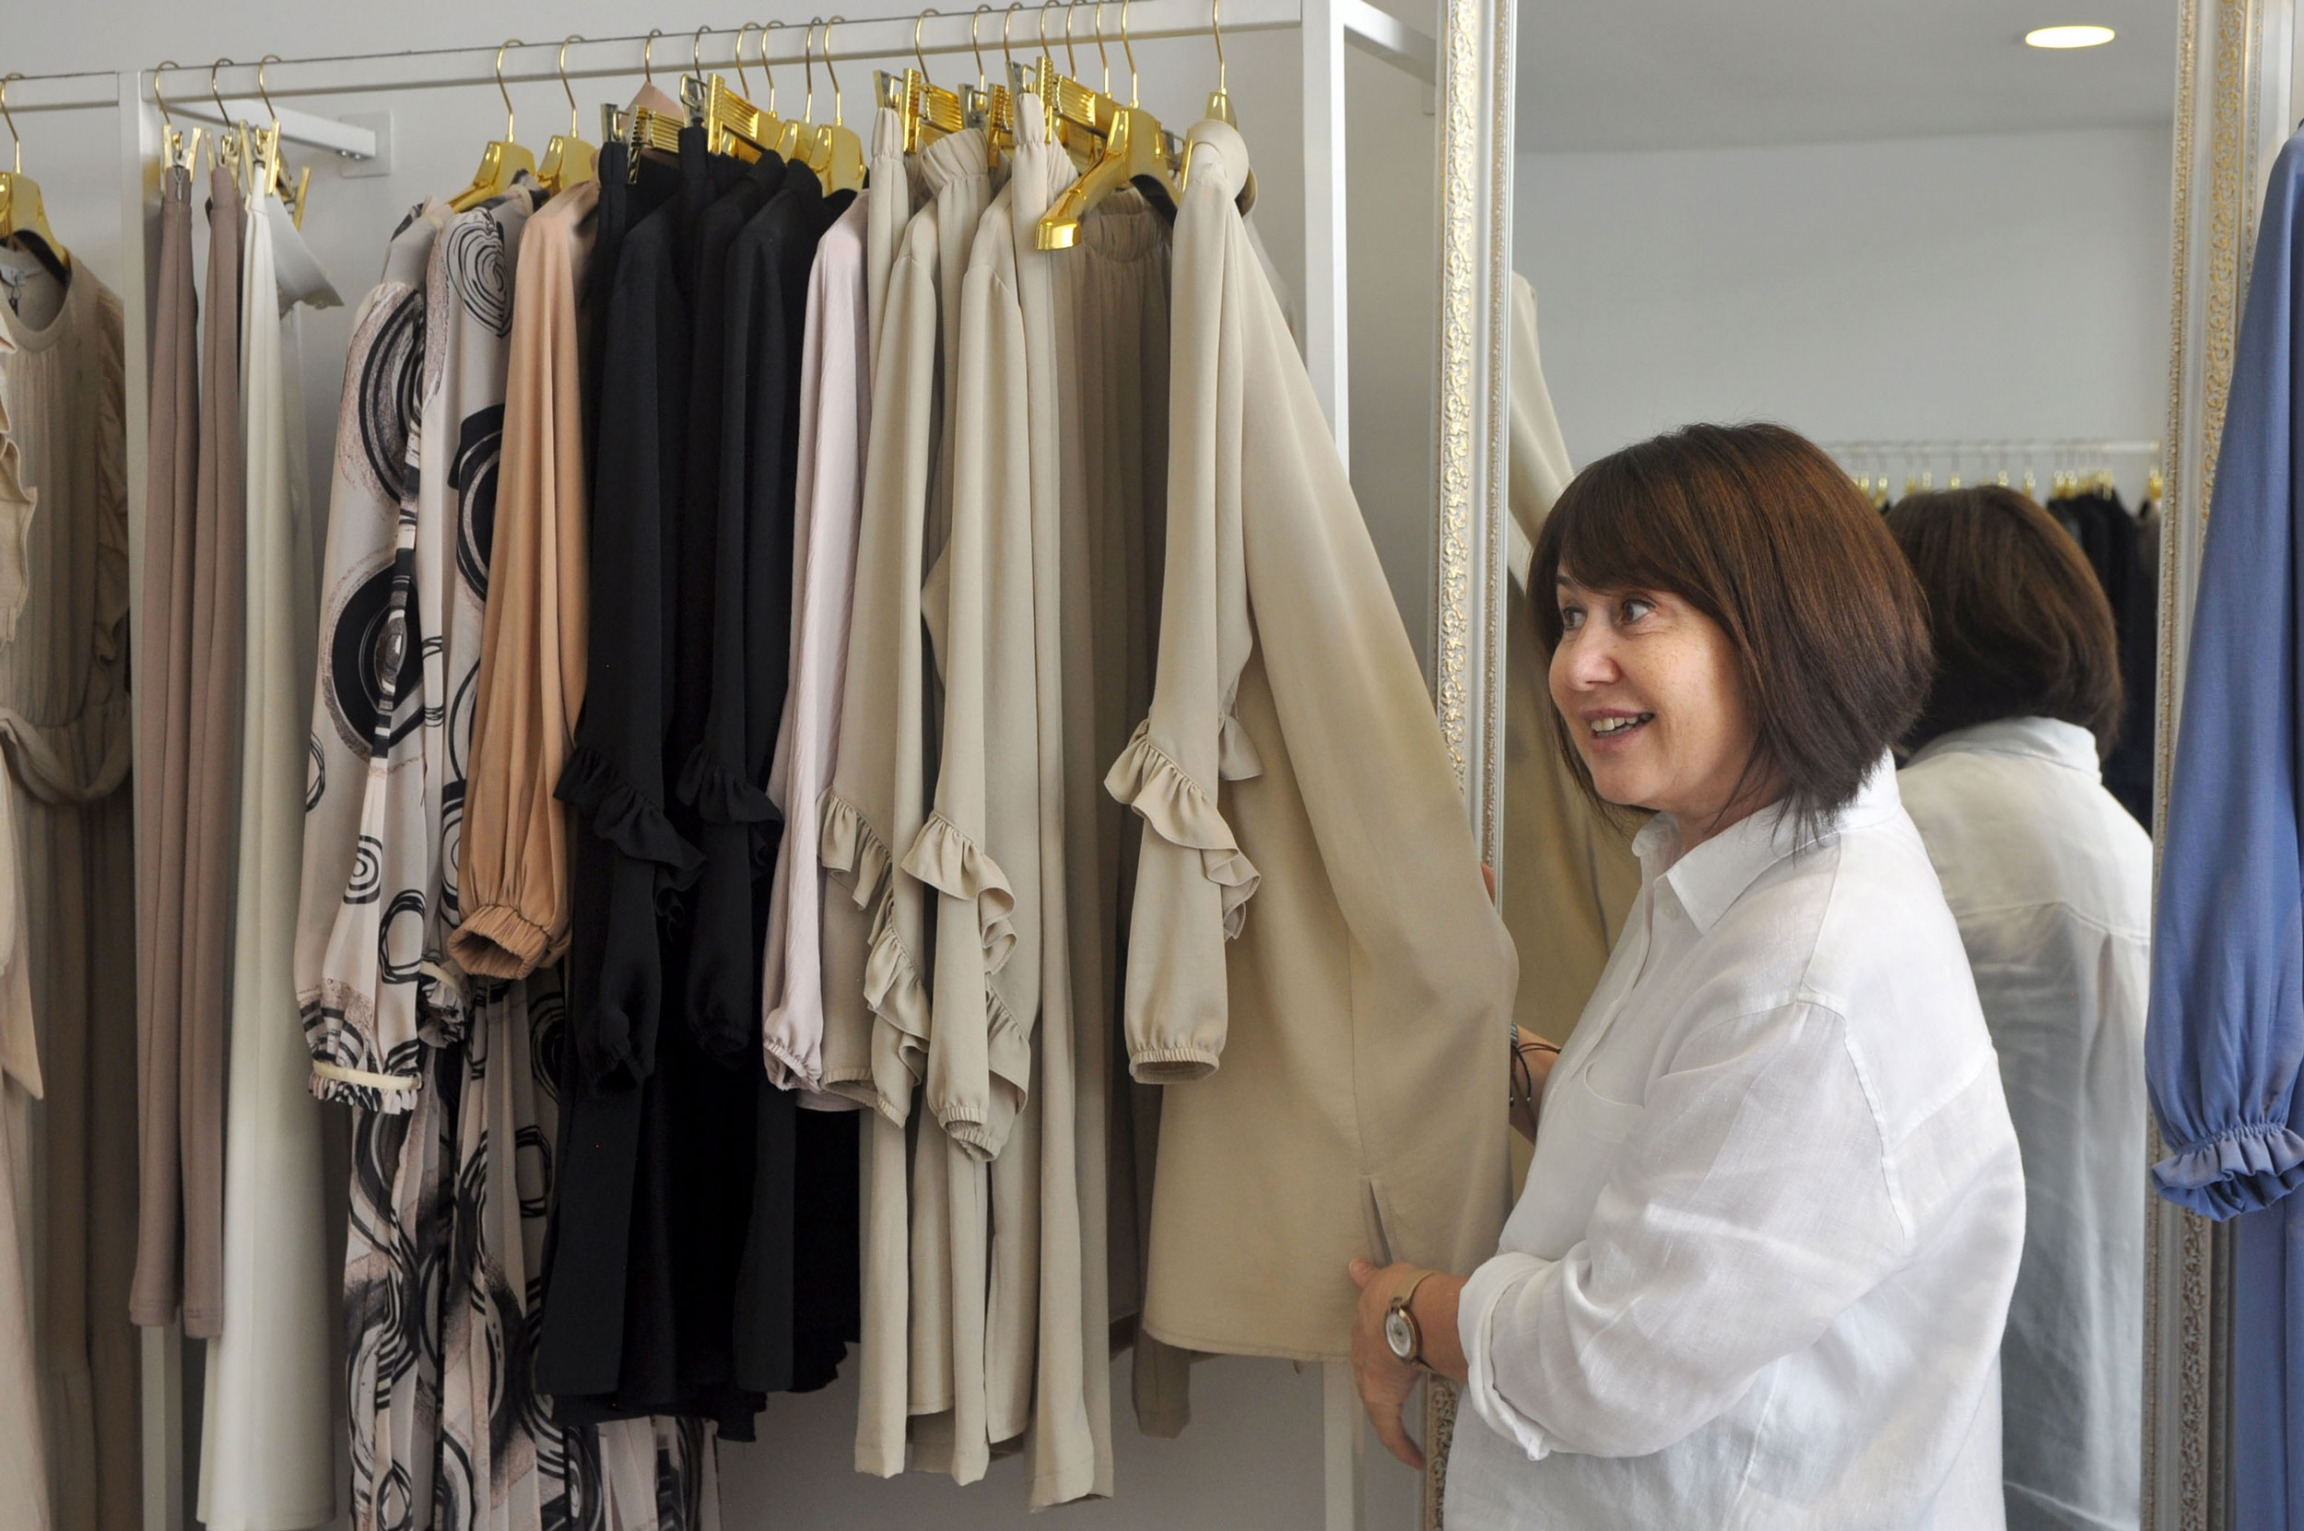 Ayşe Yıldırım started her brand, Miss Ayşe, over a decade ago.